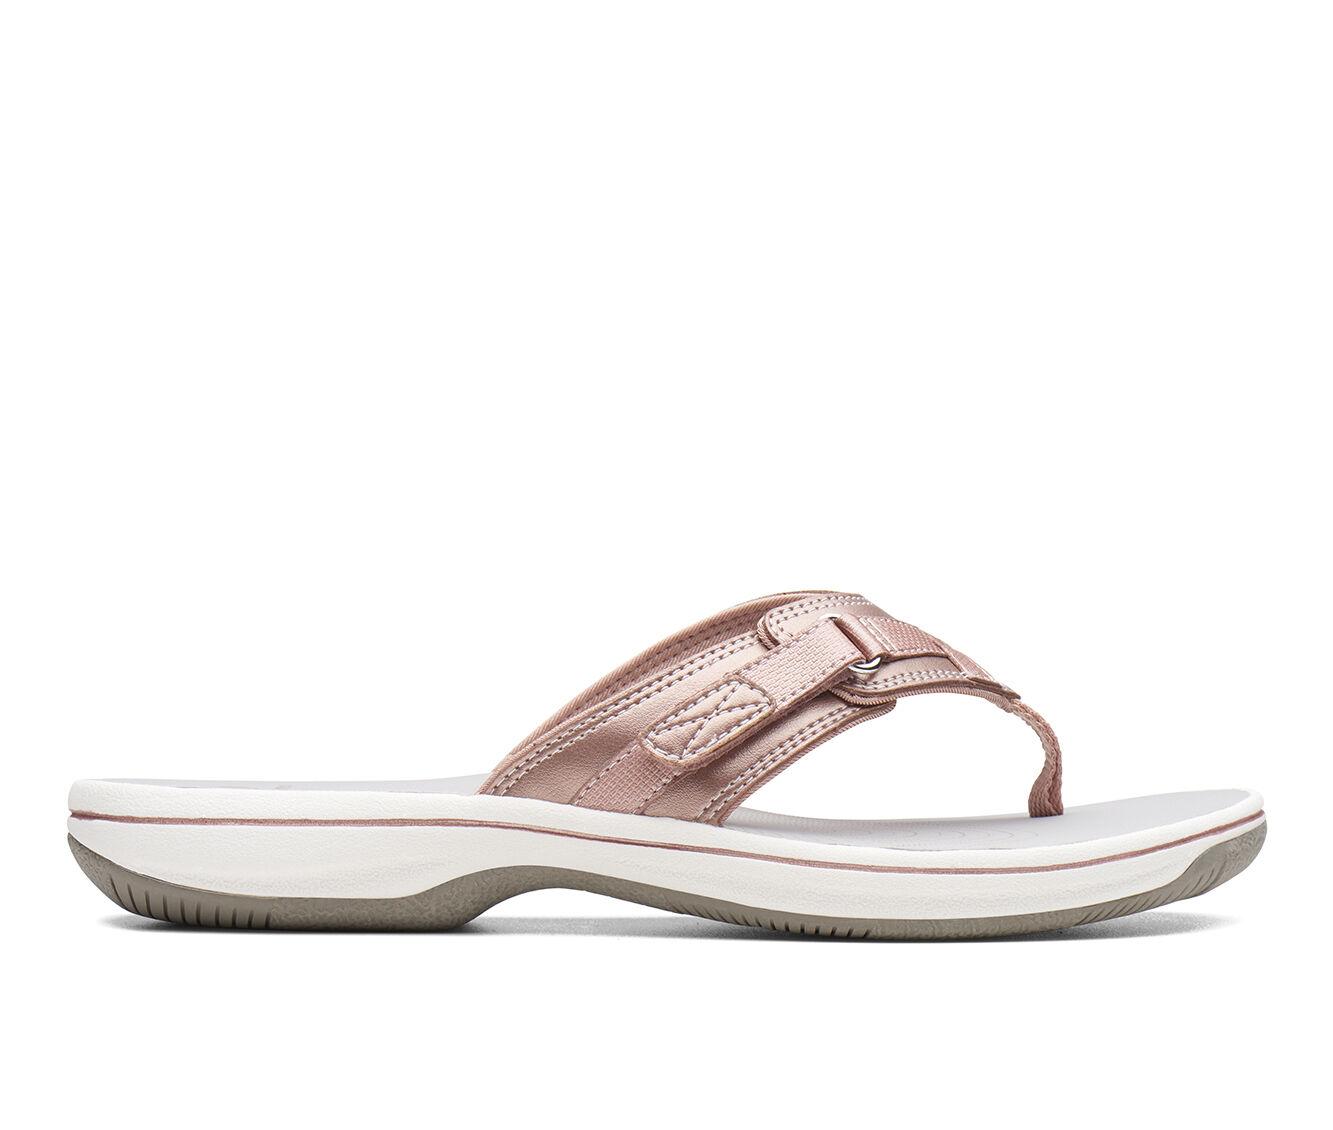 Women's Clarks Breeze Sea Sandals Rose Gold